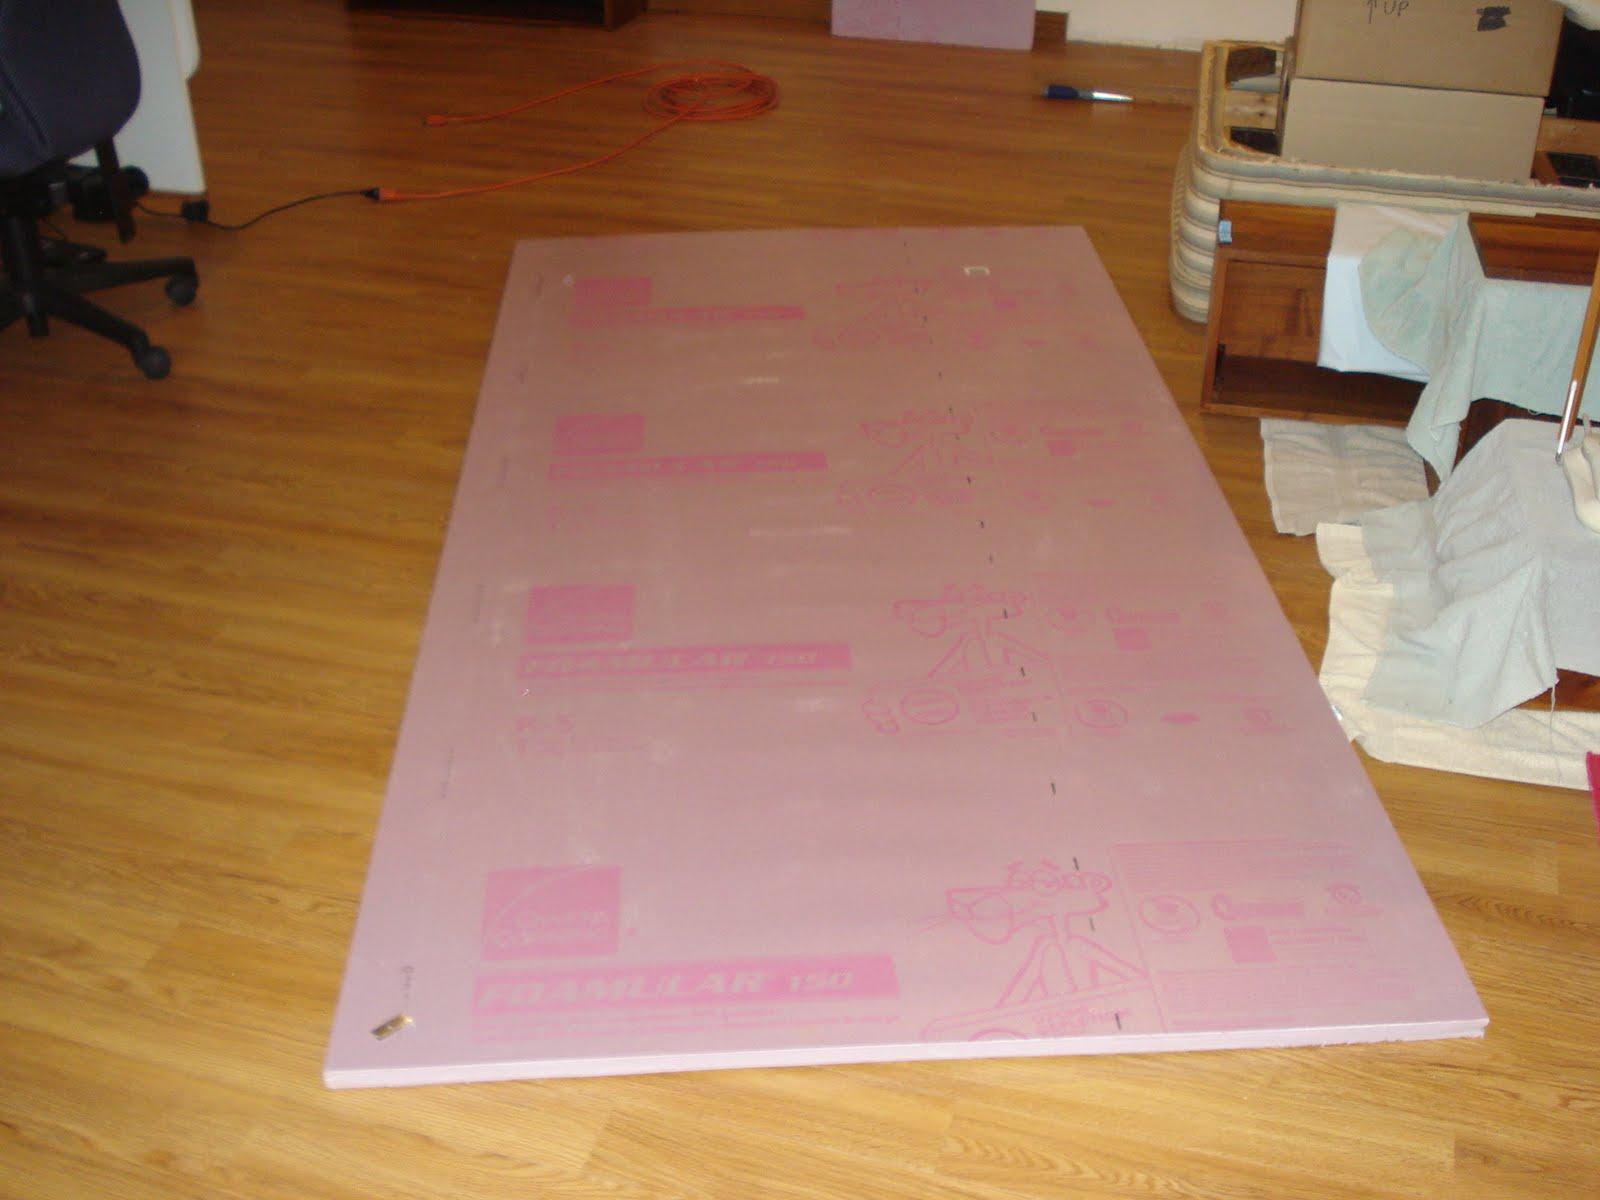 http://3.bp.blogspot.com/_ANthLNRin4U/S_kFQv917KI/AAAAAAAAADE/bFFKhzP1RHA/s1600/Styrofoam+Panel.JPG